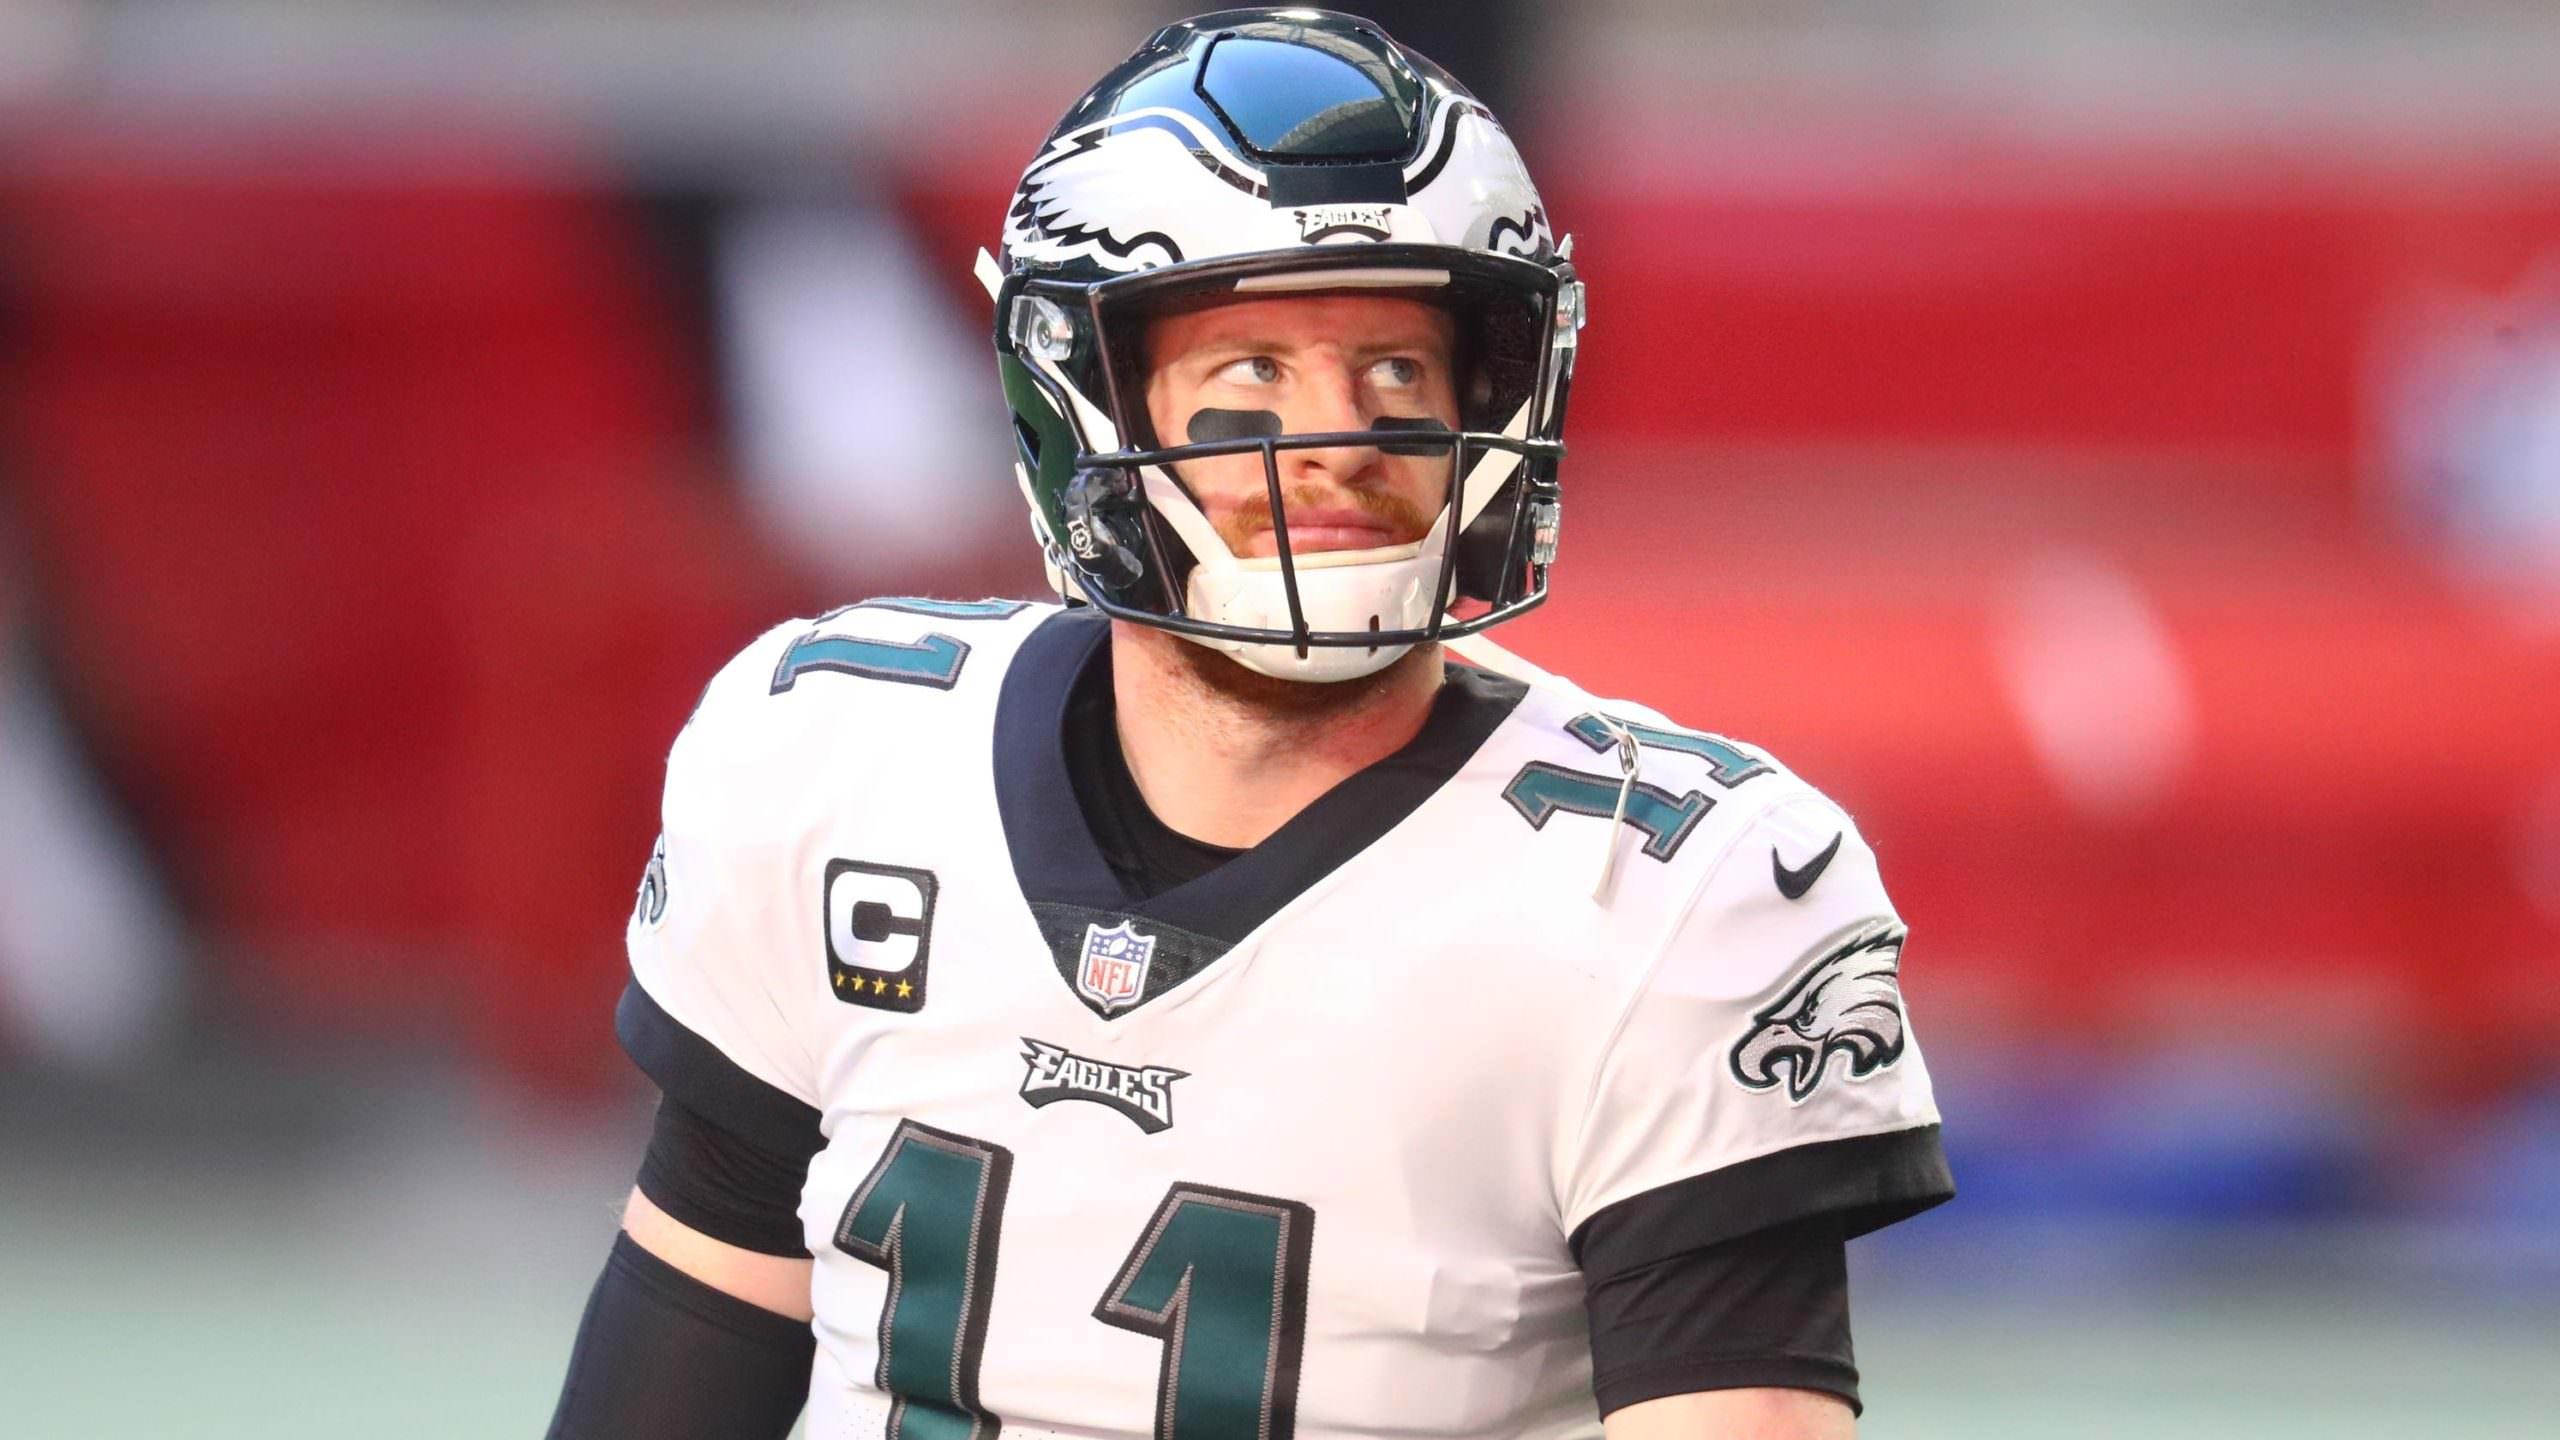 Philadelphia Eagles concorda em negociar QB Carson Wentz para Indianapolis Colts